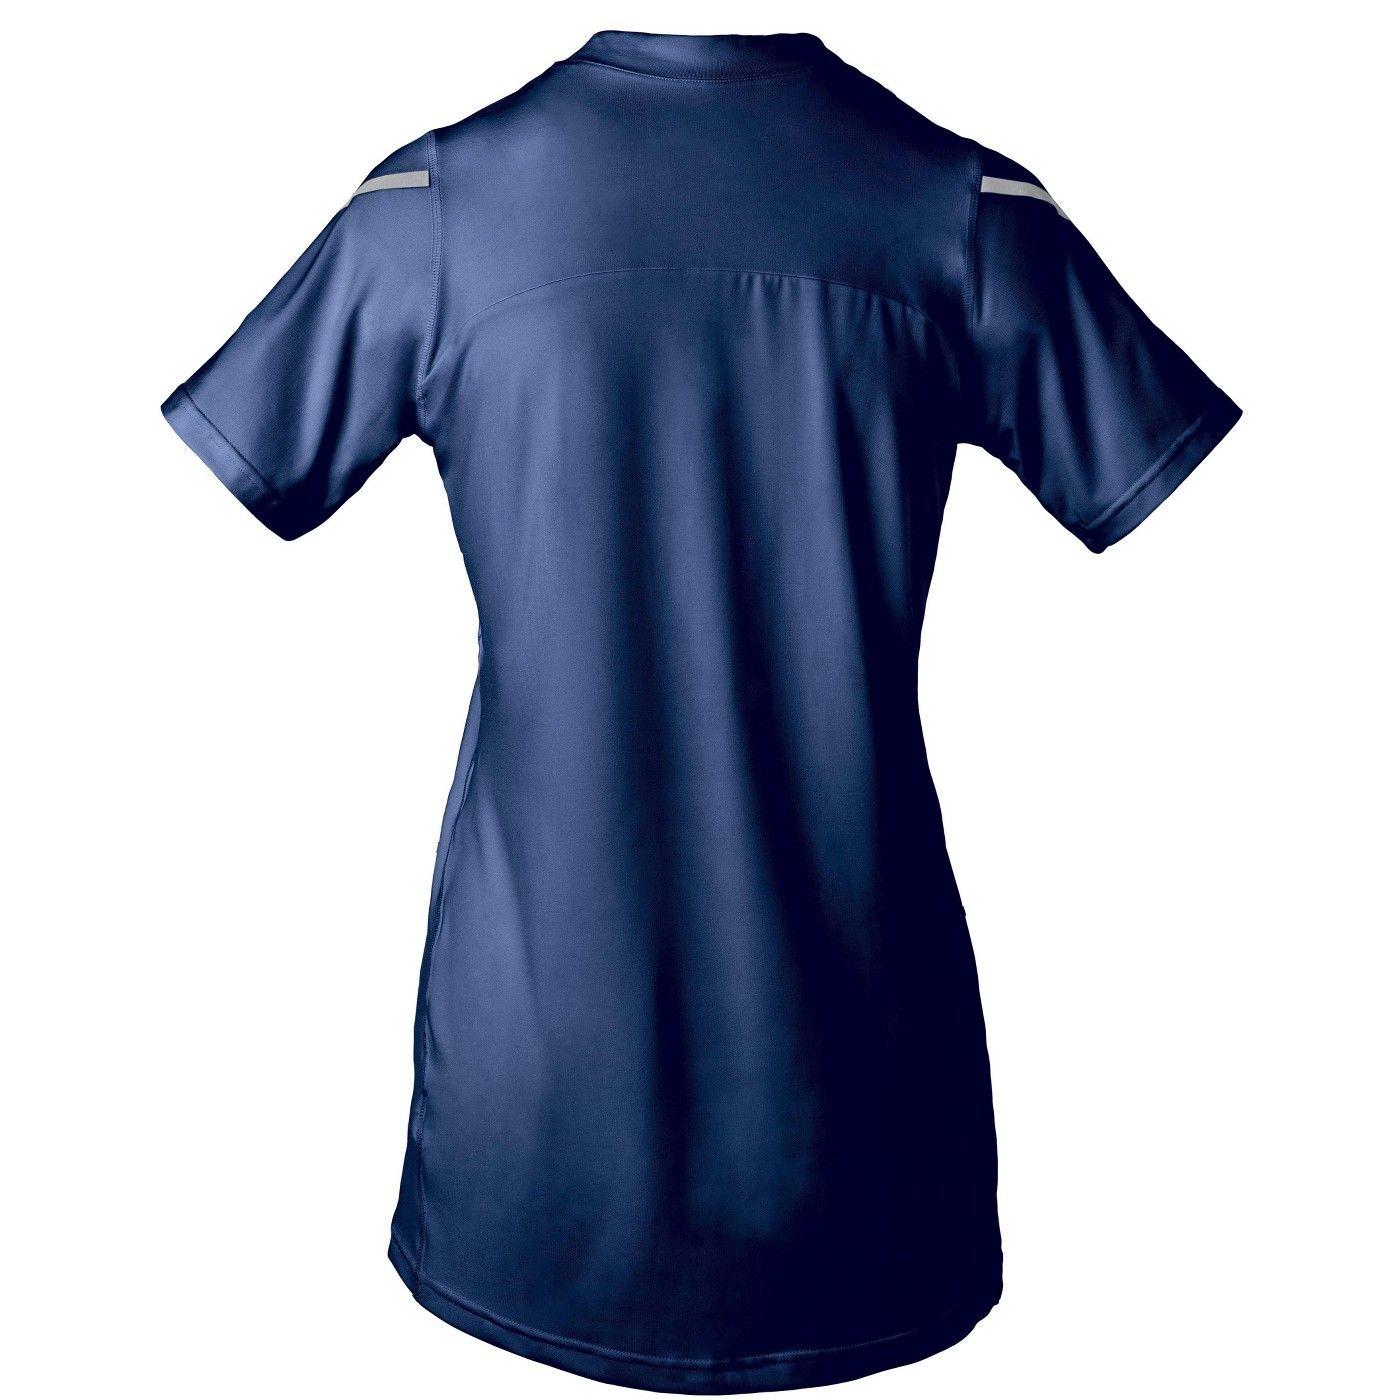 Mizuno Women S Techno Vii Short Sleeve Volleyball Jersey In 2020 Volleyball Jerseys Women Short Sleeve